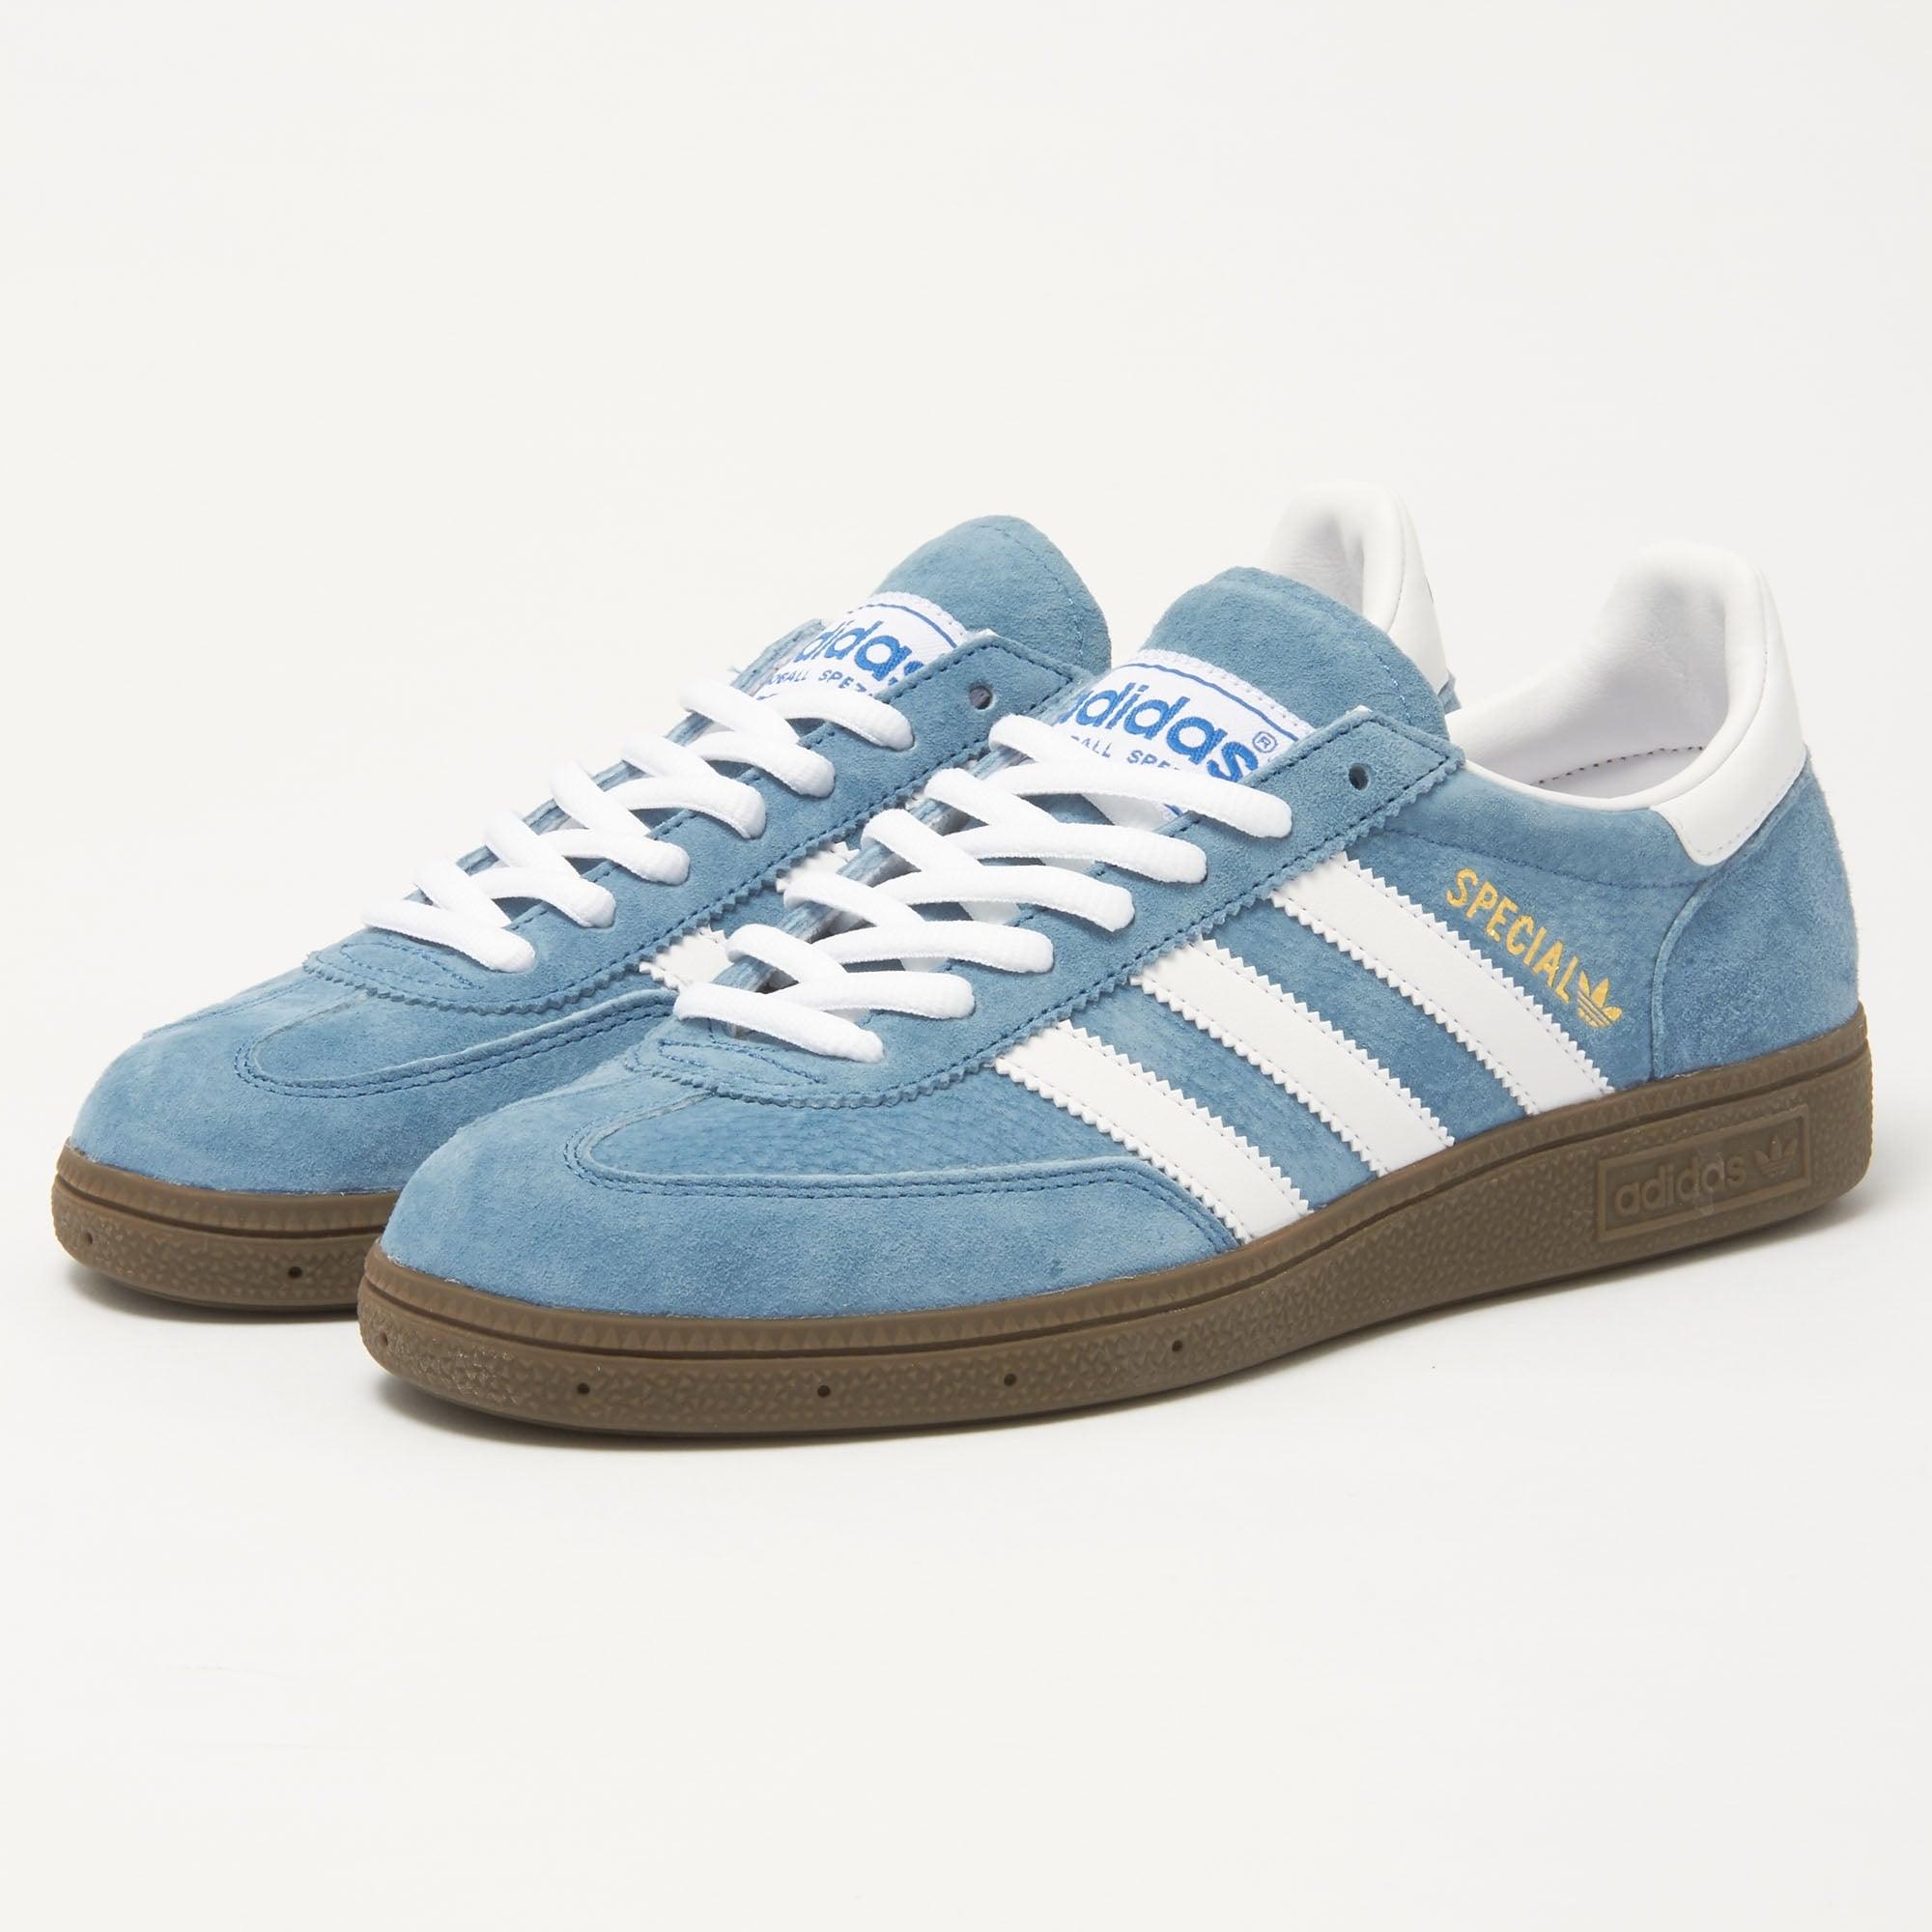 Adidas Handball Spezial Blue Sneaker 033620